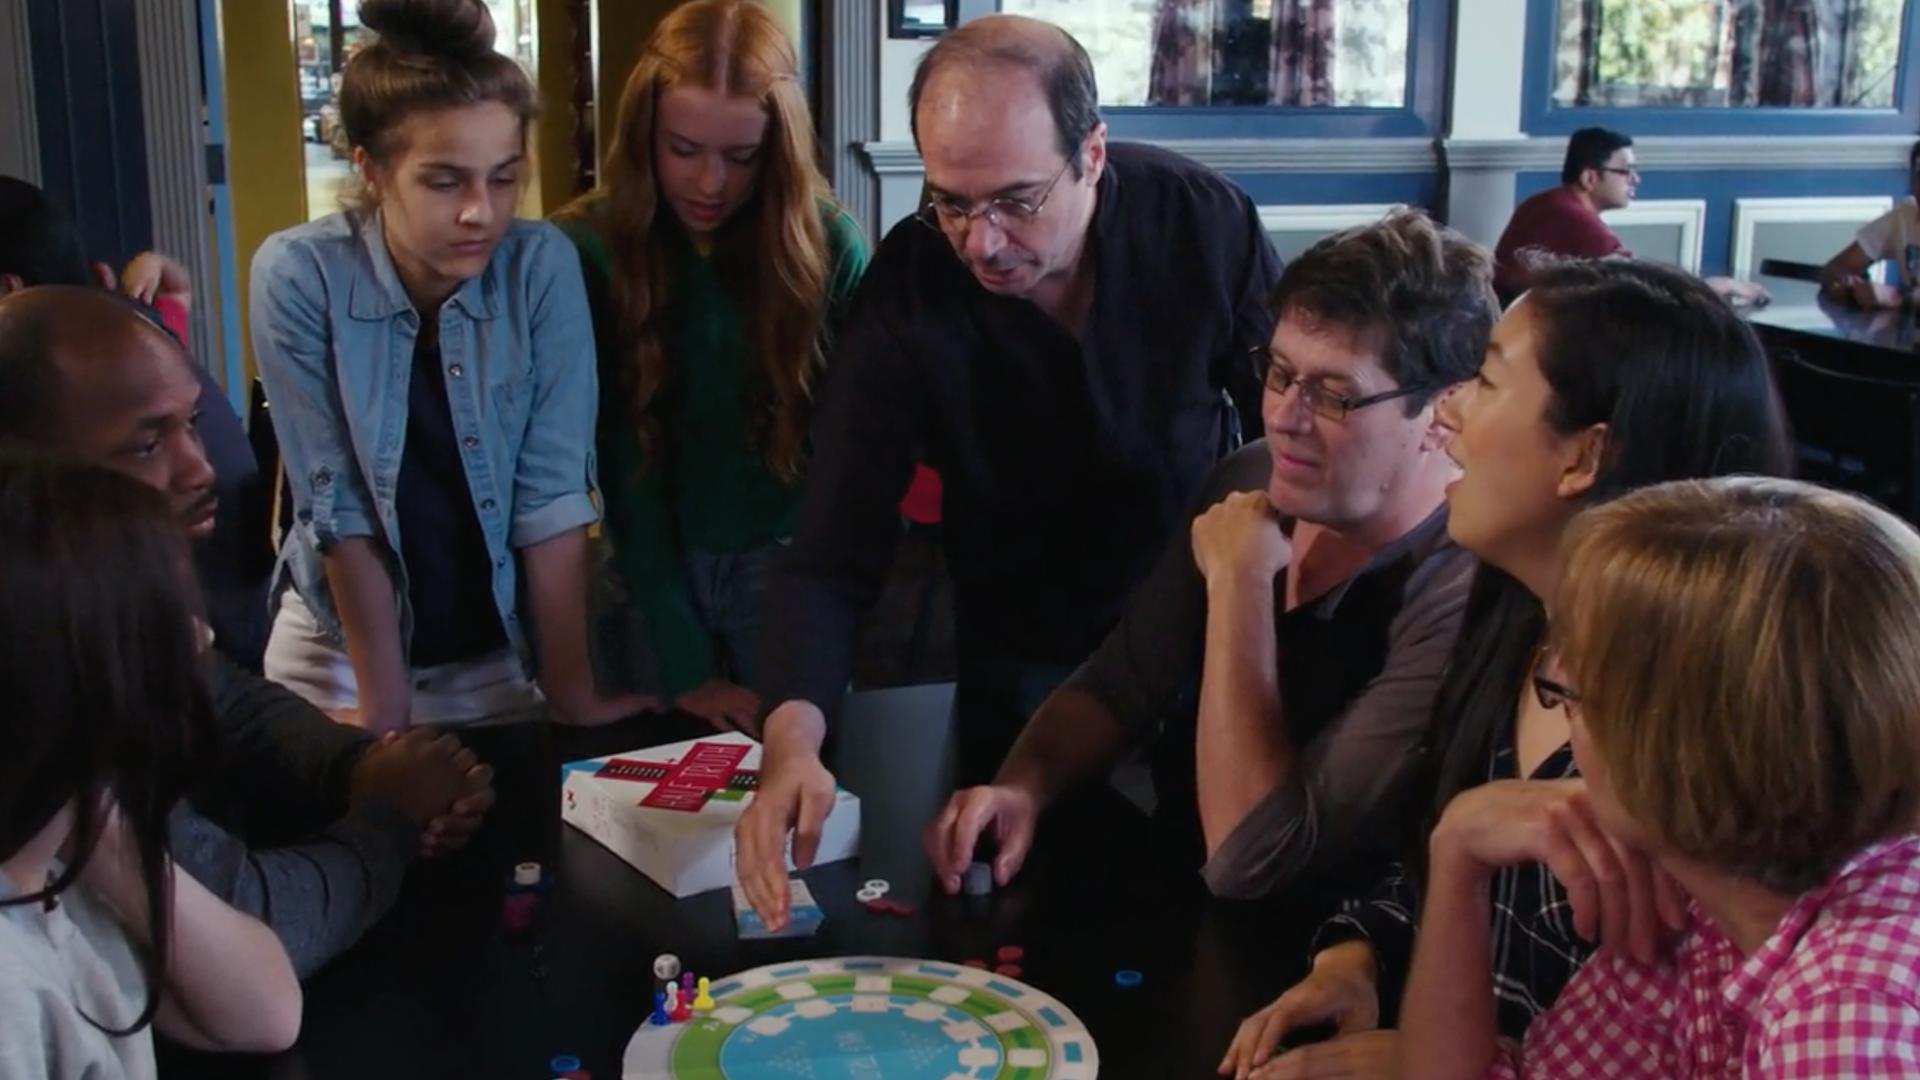 Magic: The Gathering creator Richard Garfield on 35 years of making games